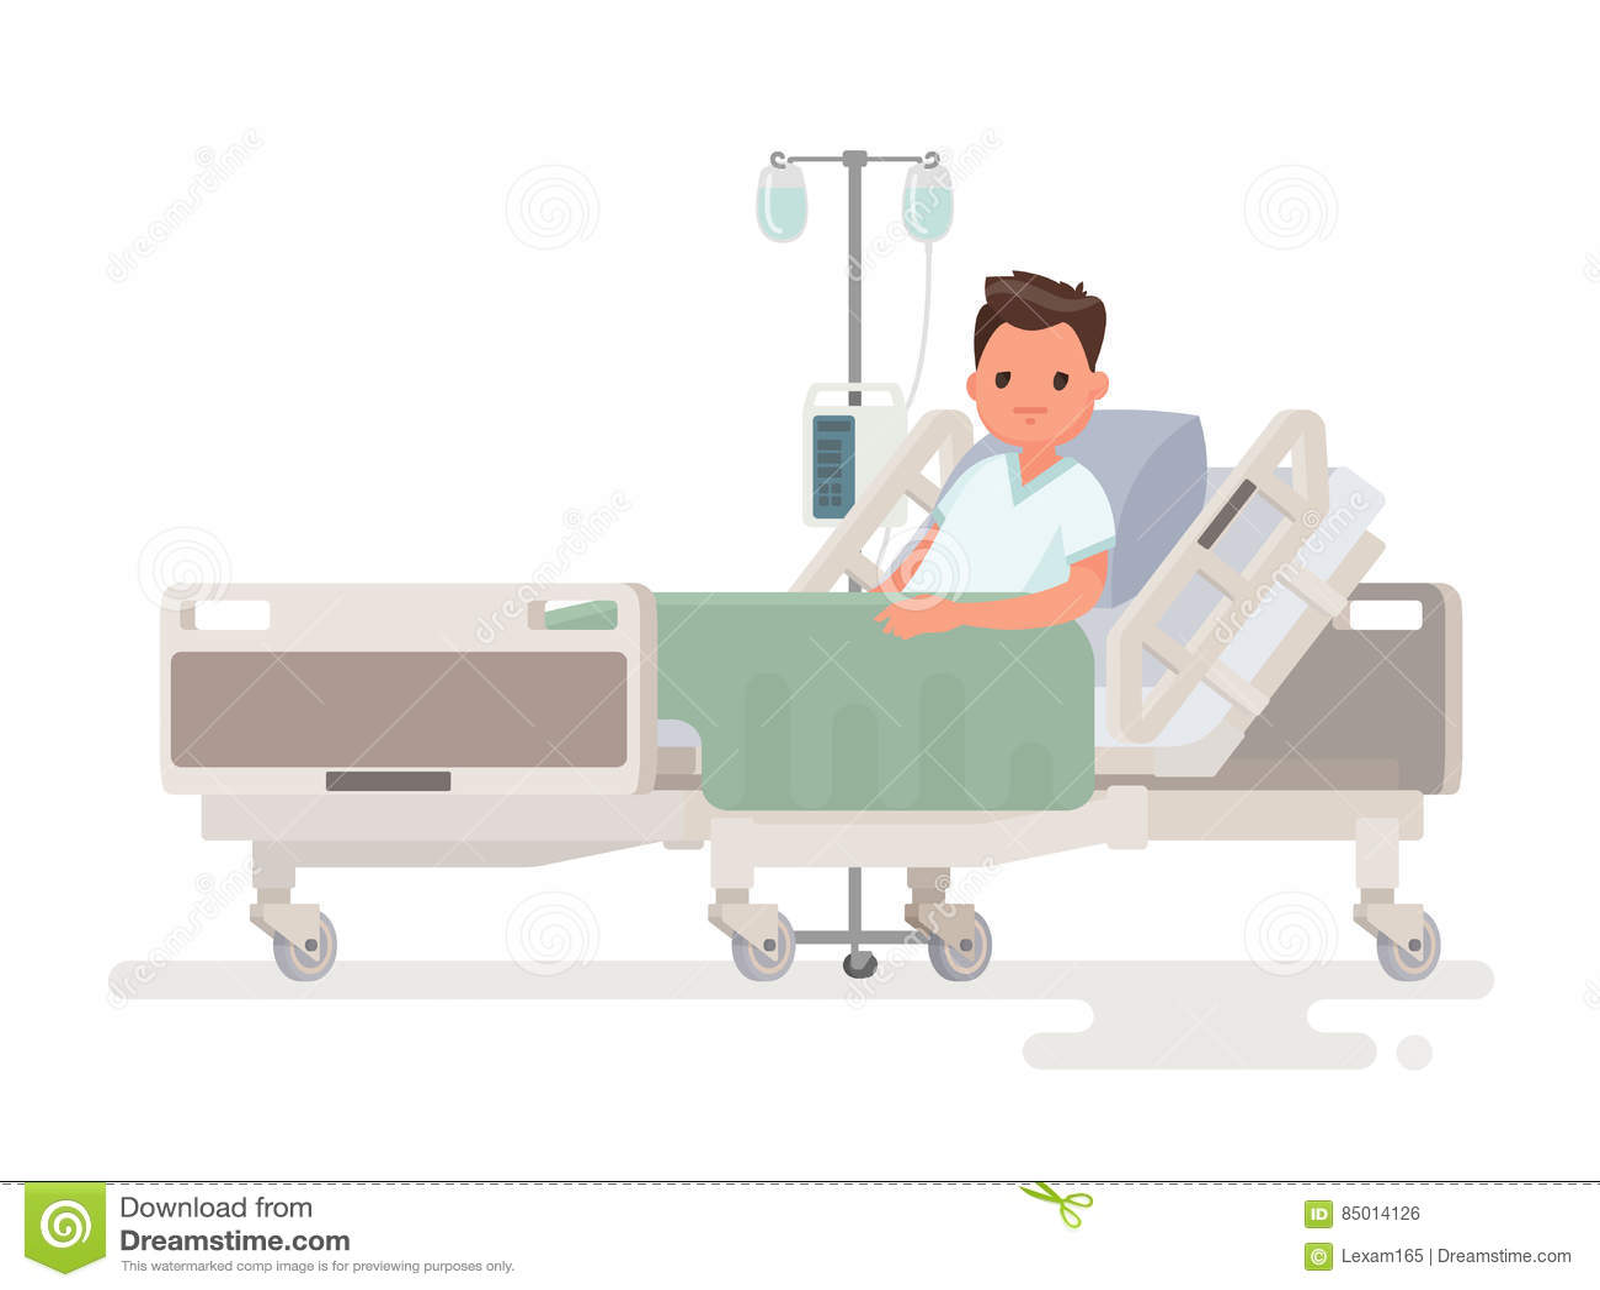 hospitalizaci u00f3n del paciente una persona enferma est u00e1 en funny sick person clipart funny sick person clipart